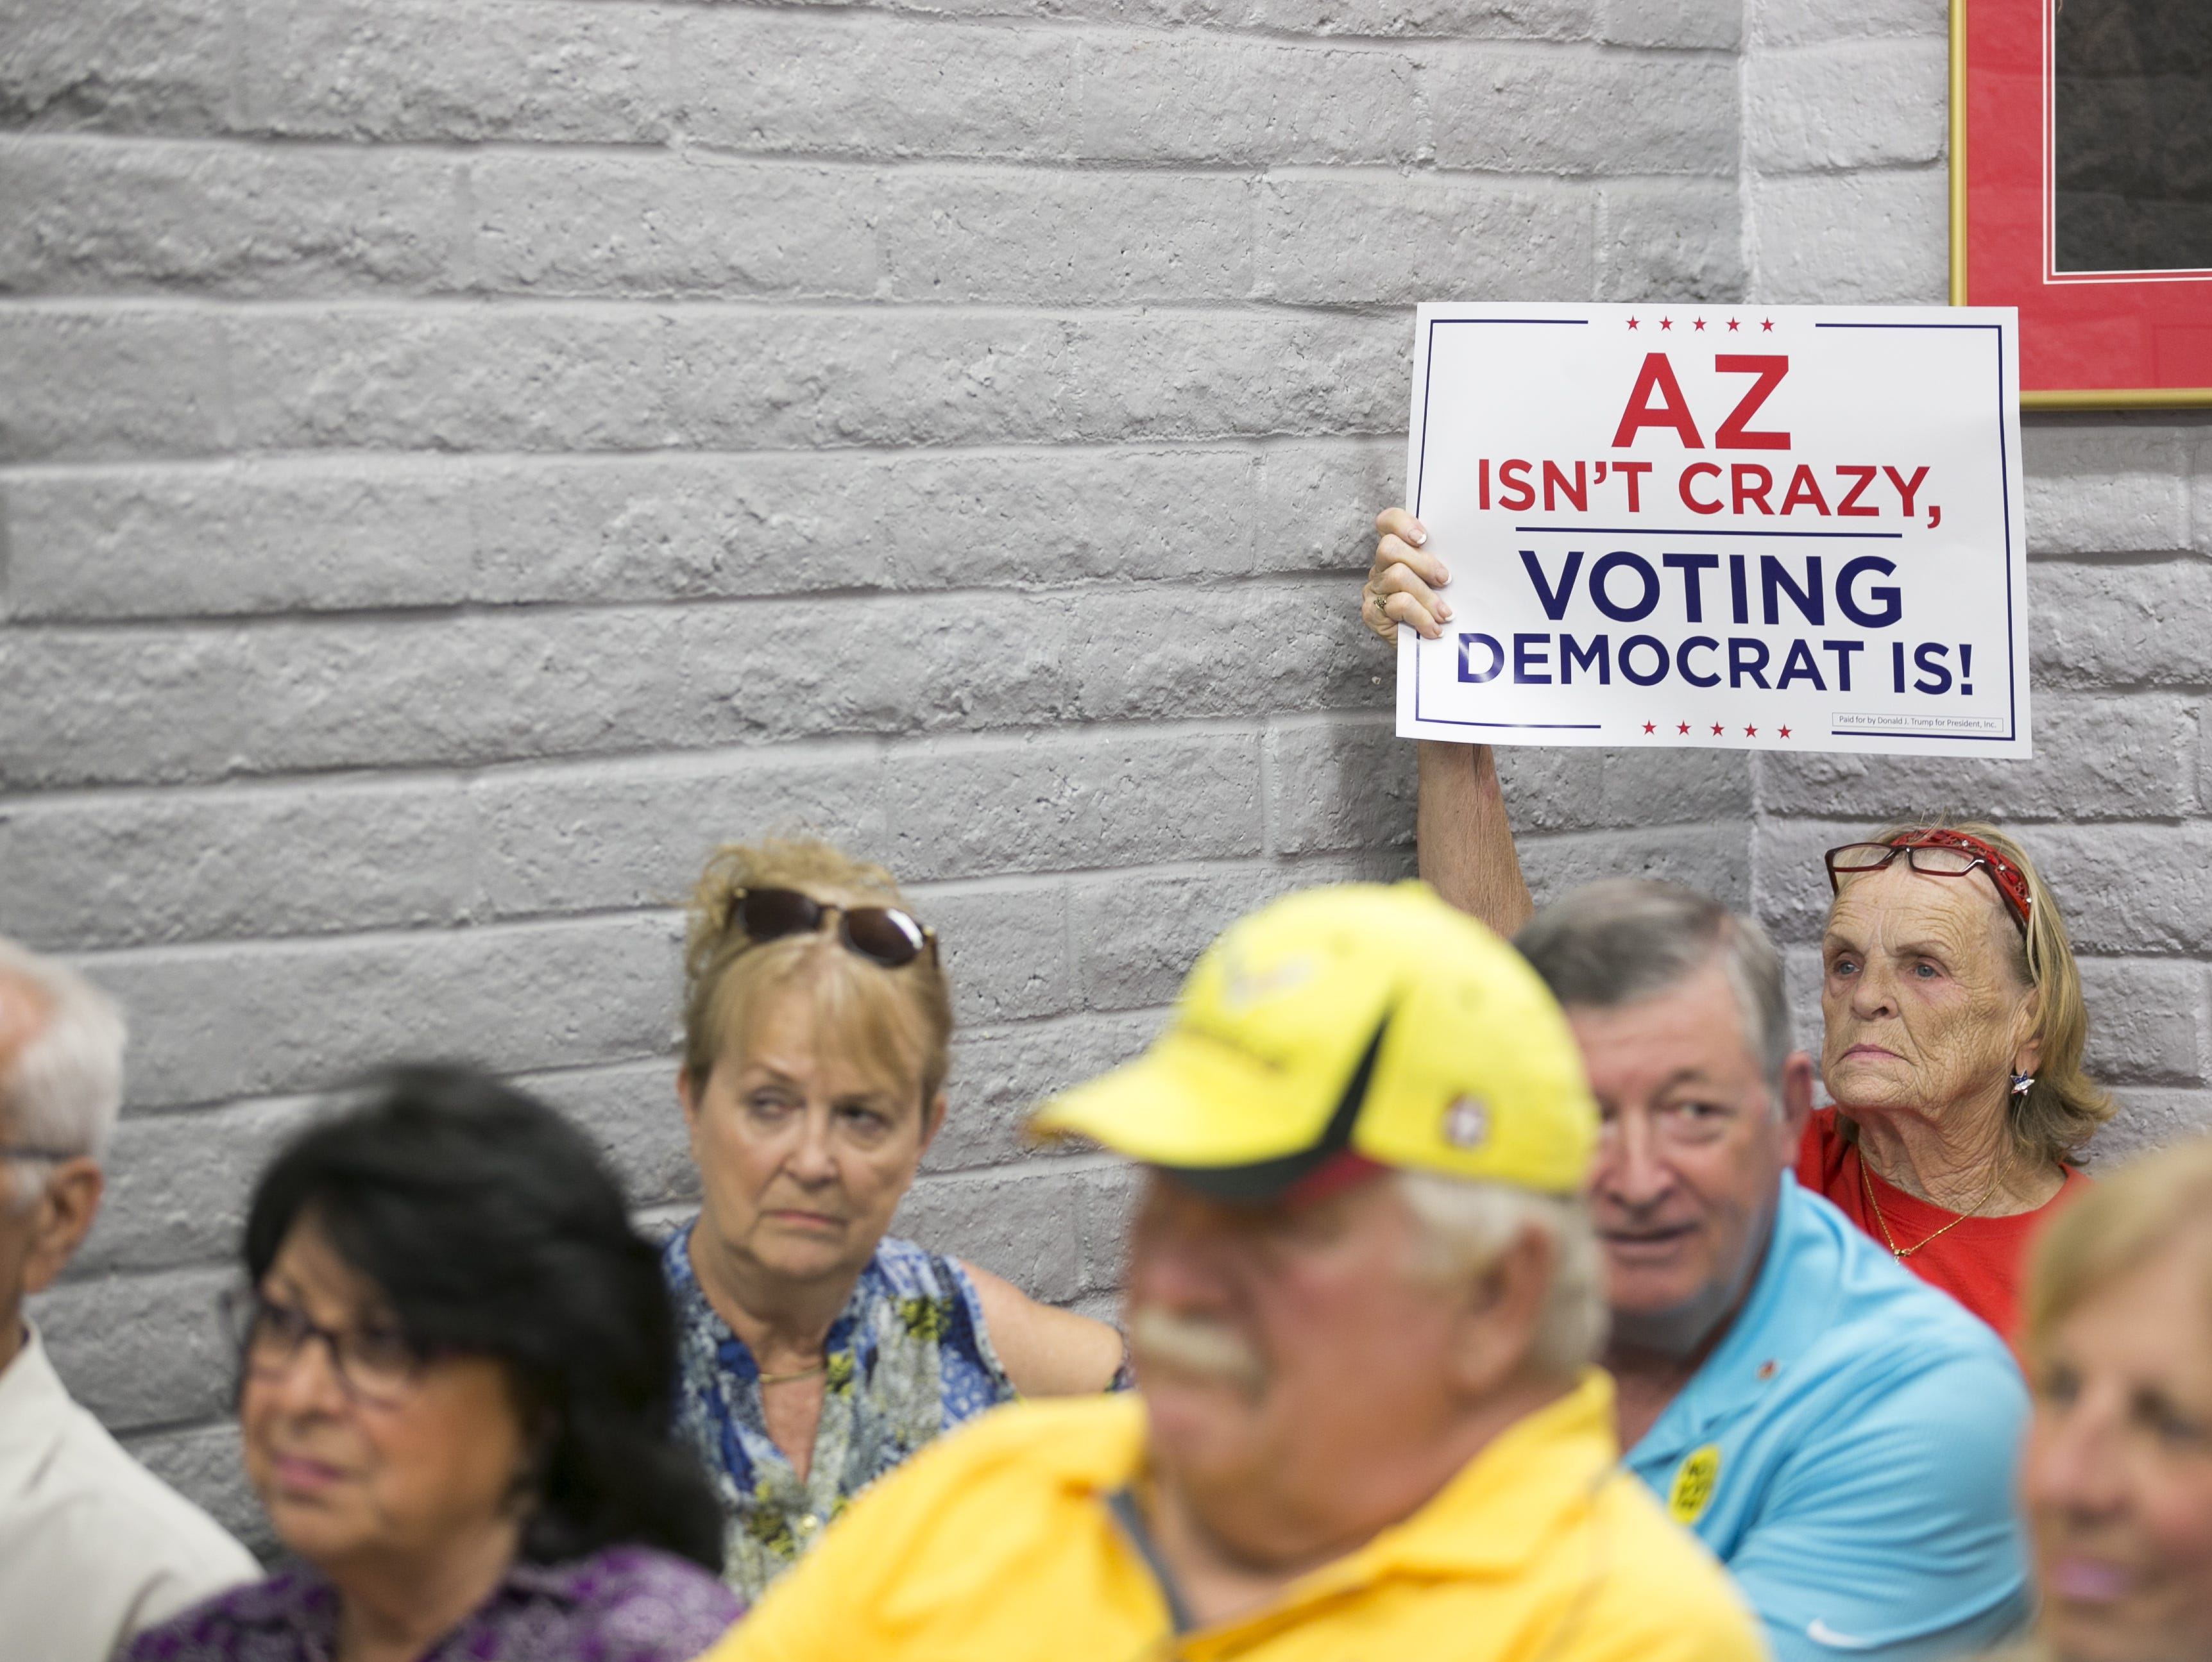 Republican supporters watch Sen. Lindsey Graham, R-S.C. as he speaks at the Arizona GOP headquarters in Phoenix, Ariz. on Oct. 27, 2018.